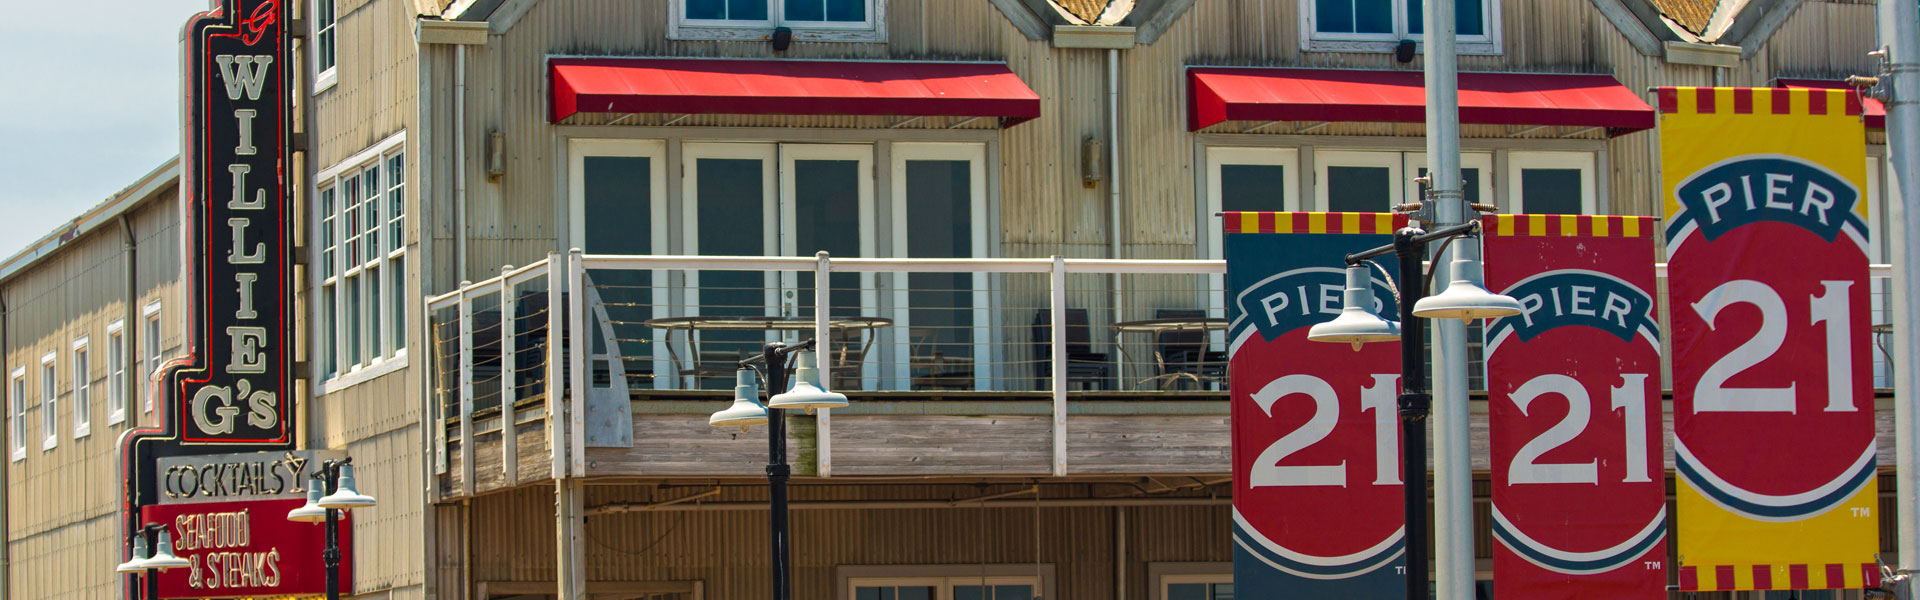 Willie G's Seafood & Steaks, Galveston TX